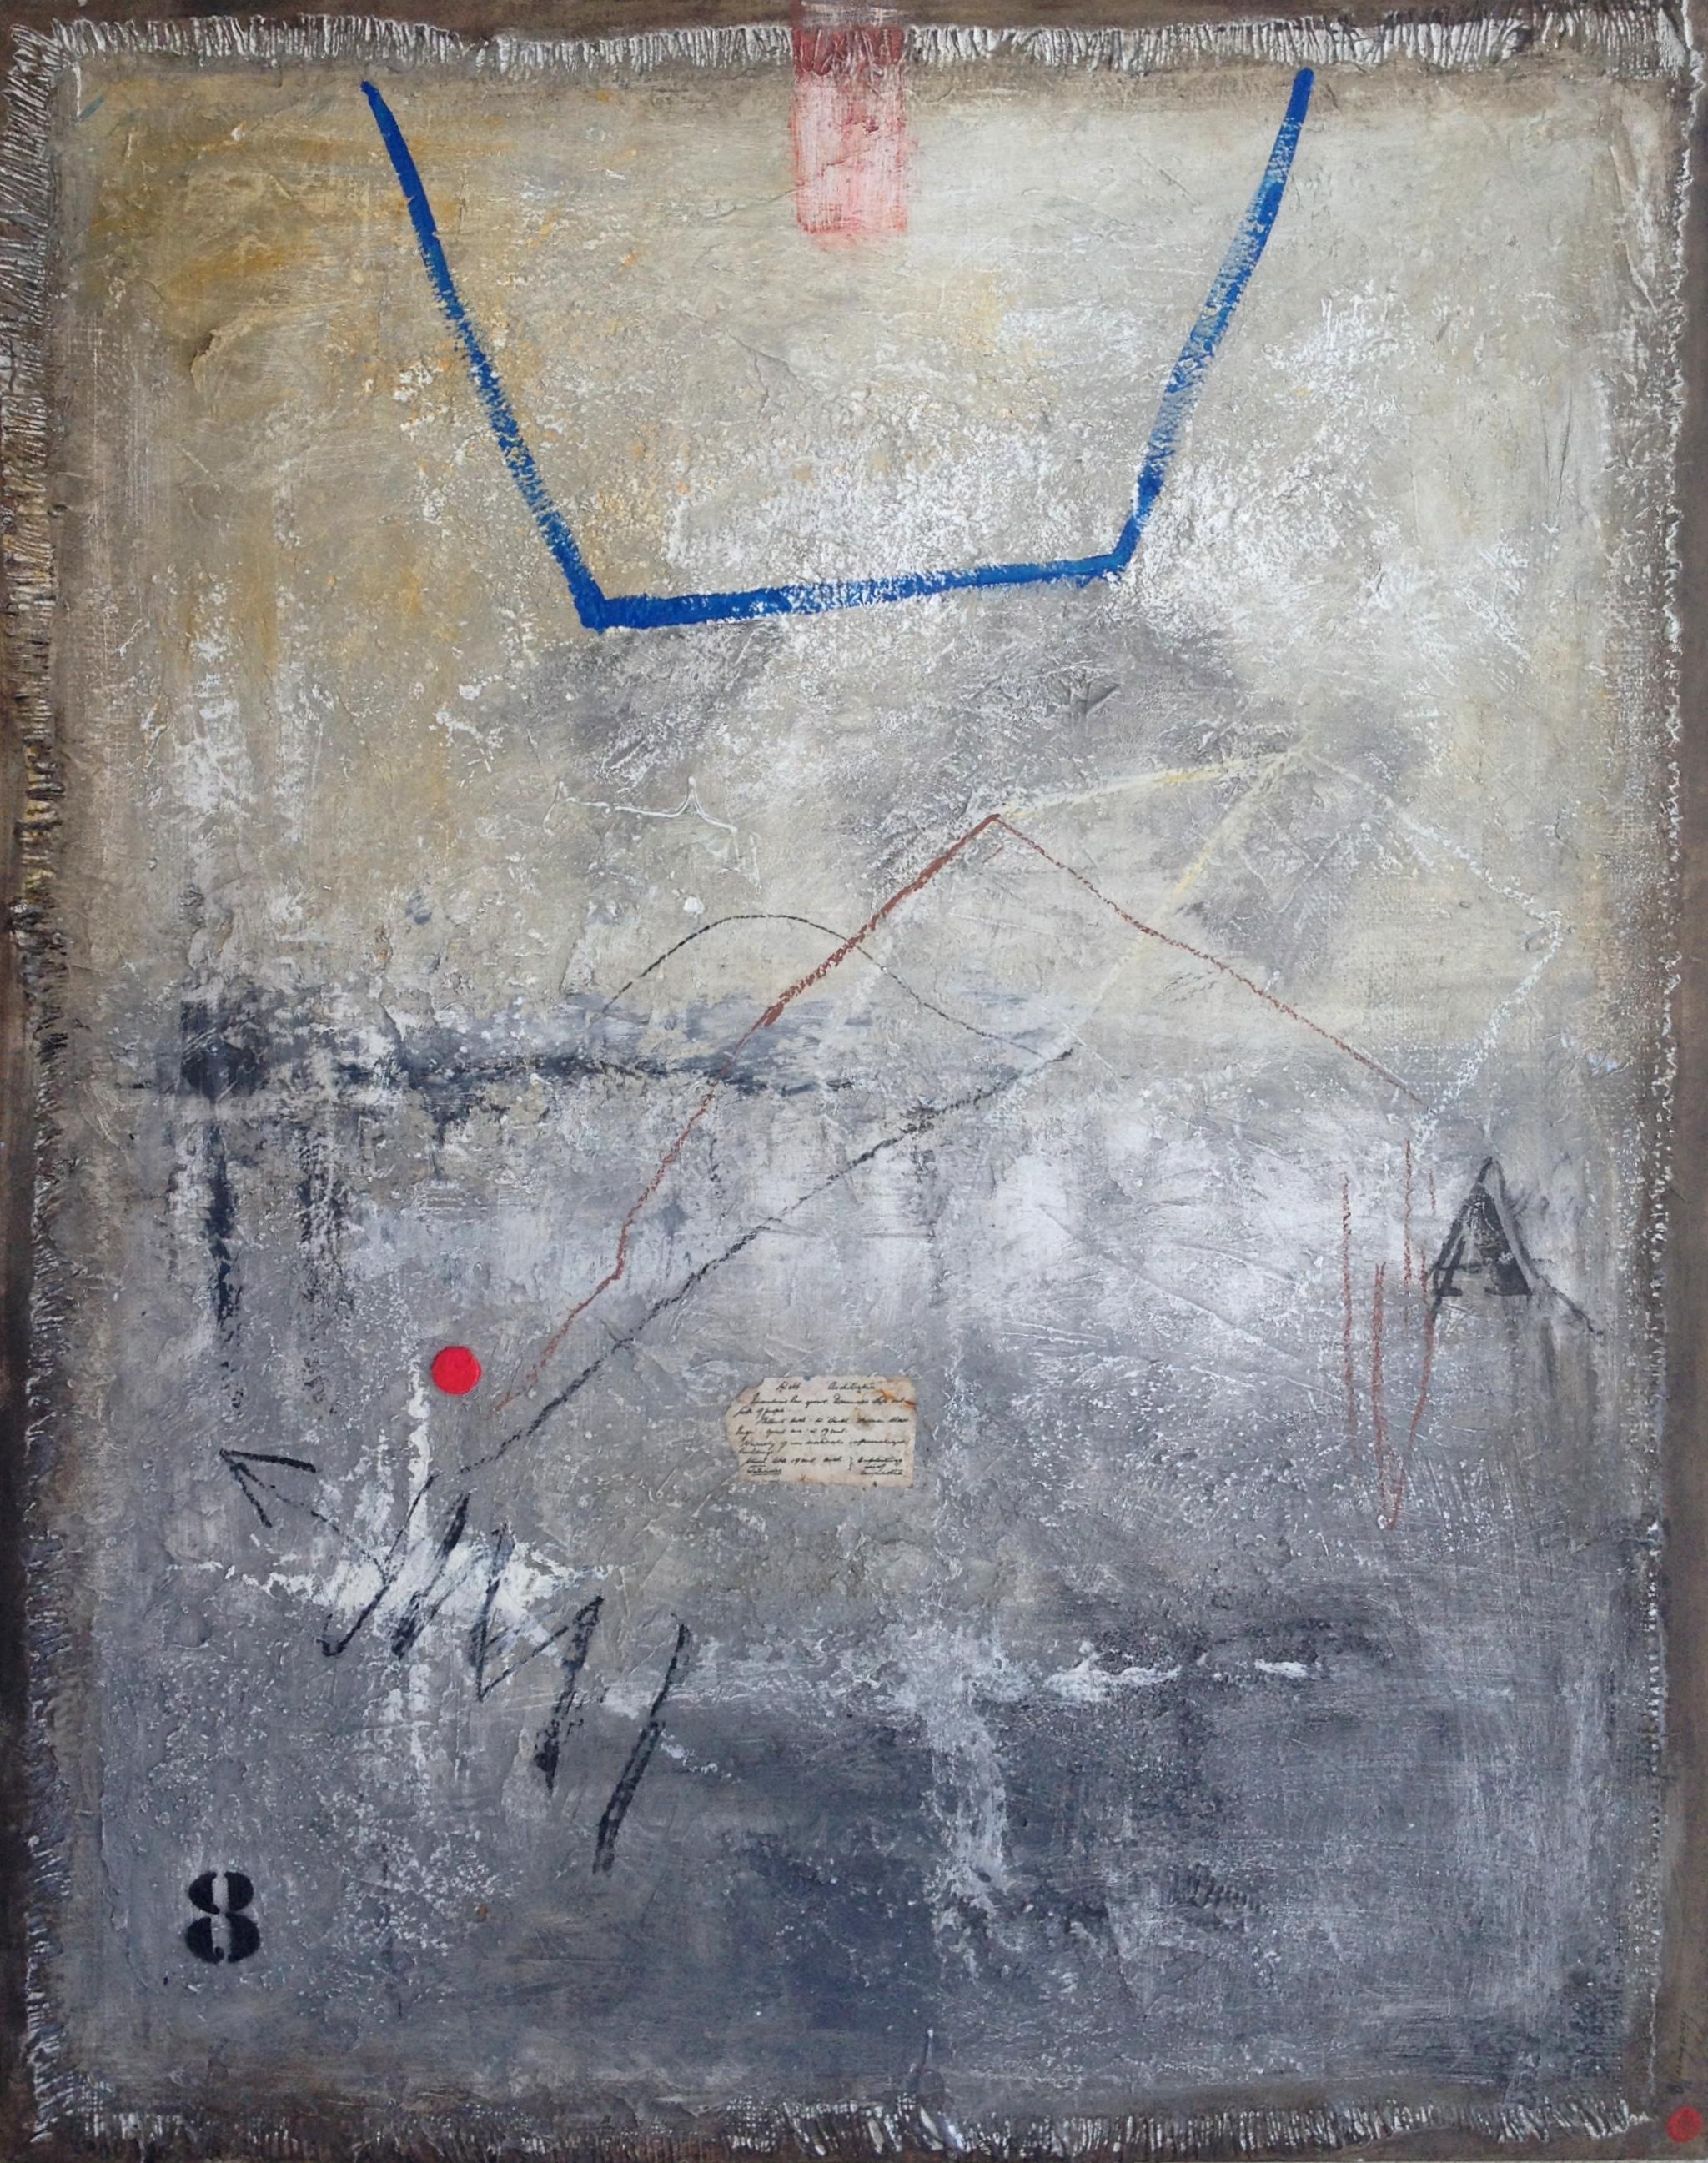 SENSACIONES 23 / 96x120 cm